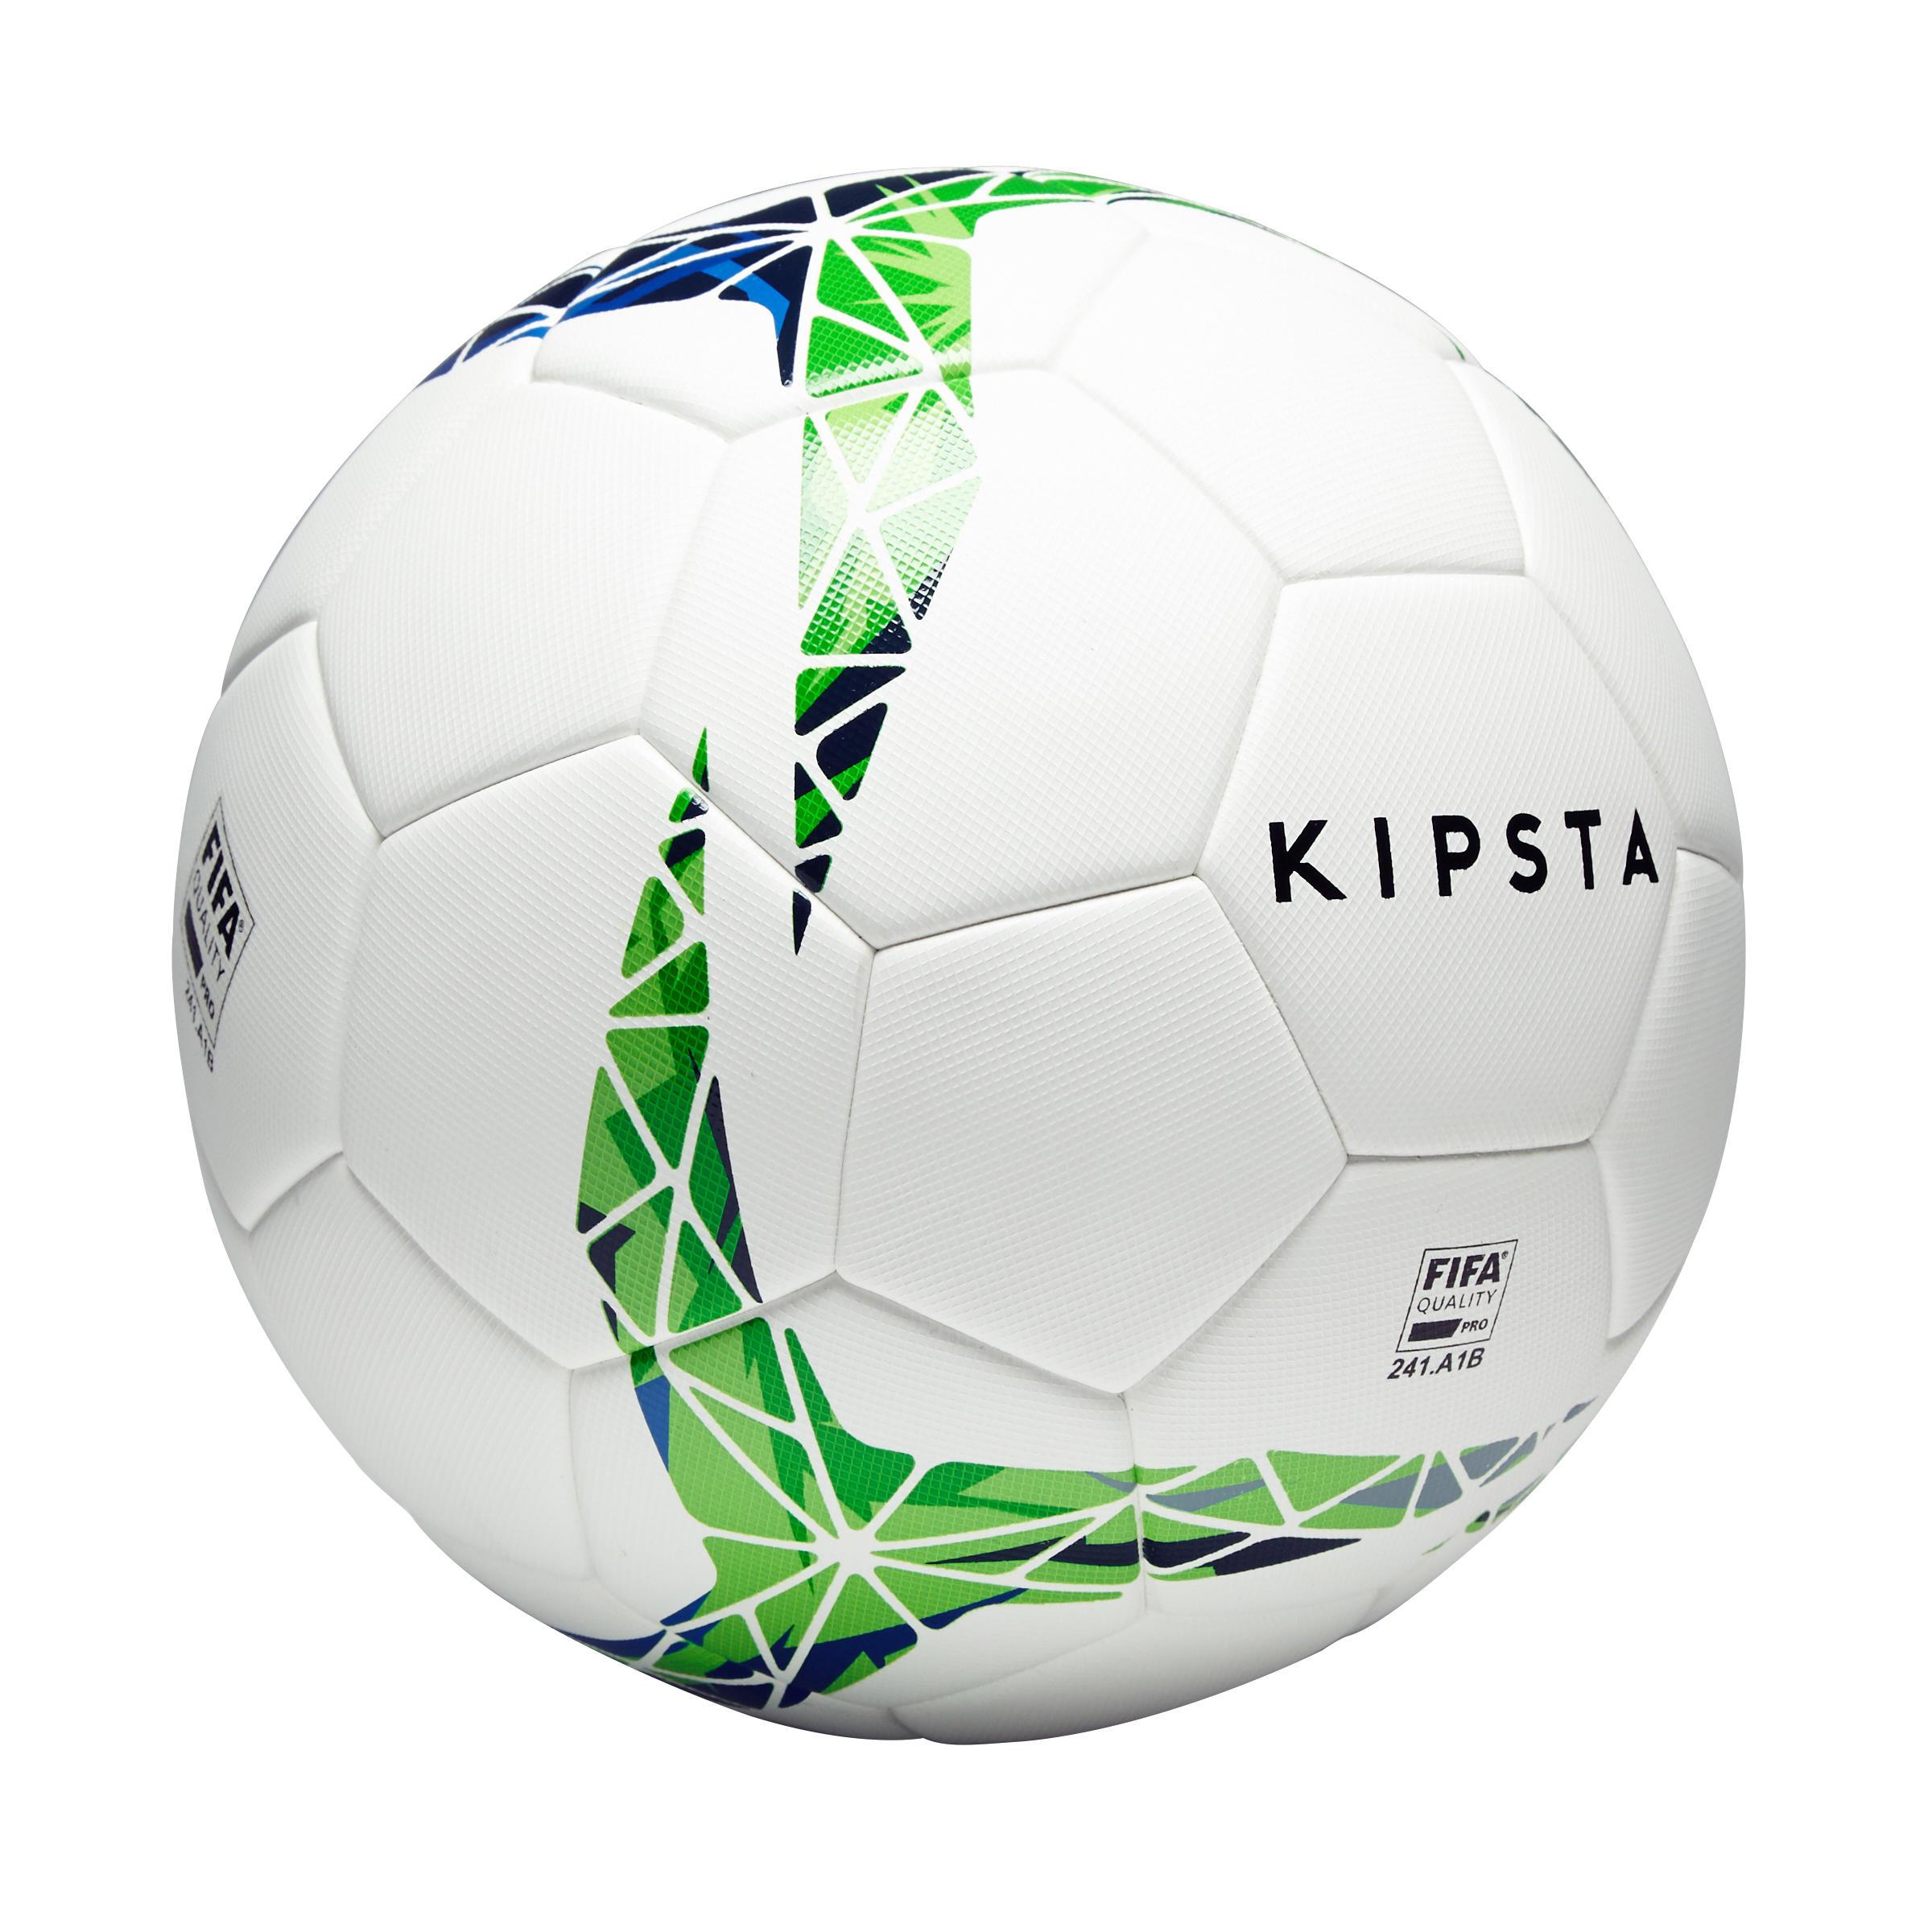 Kipsta Voetbal F900 FIFA Pro maat 5 wit kopen